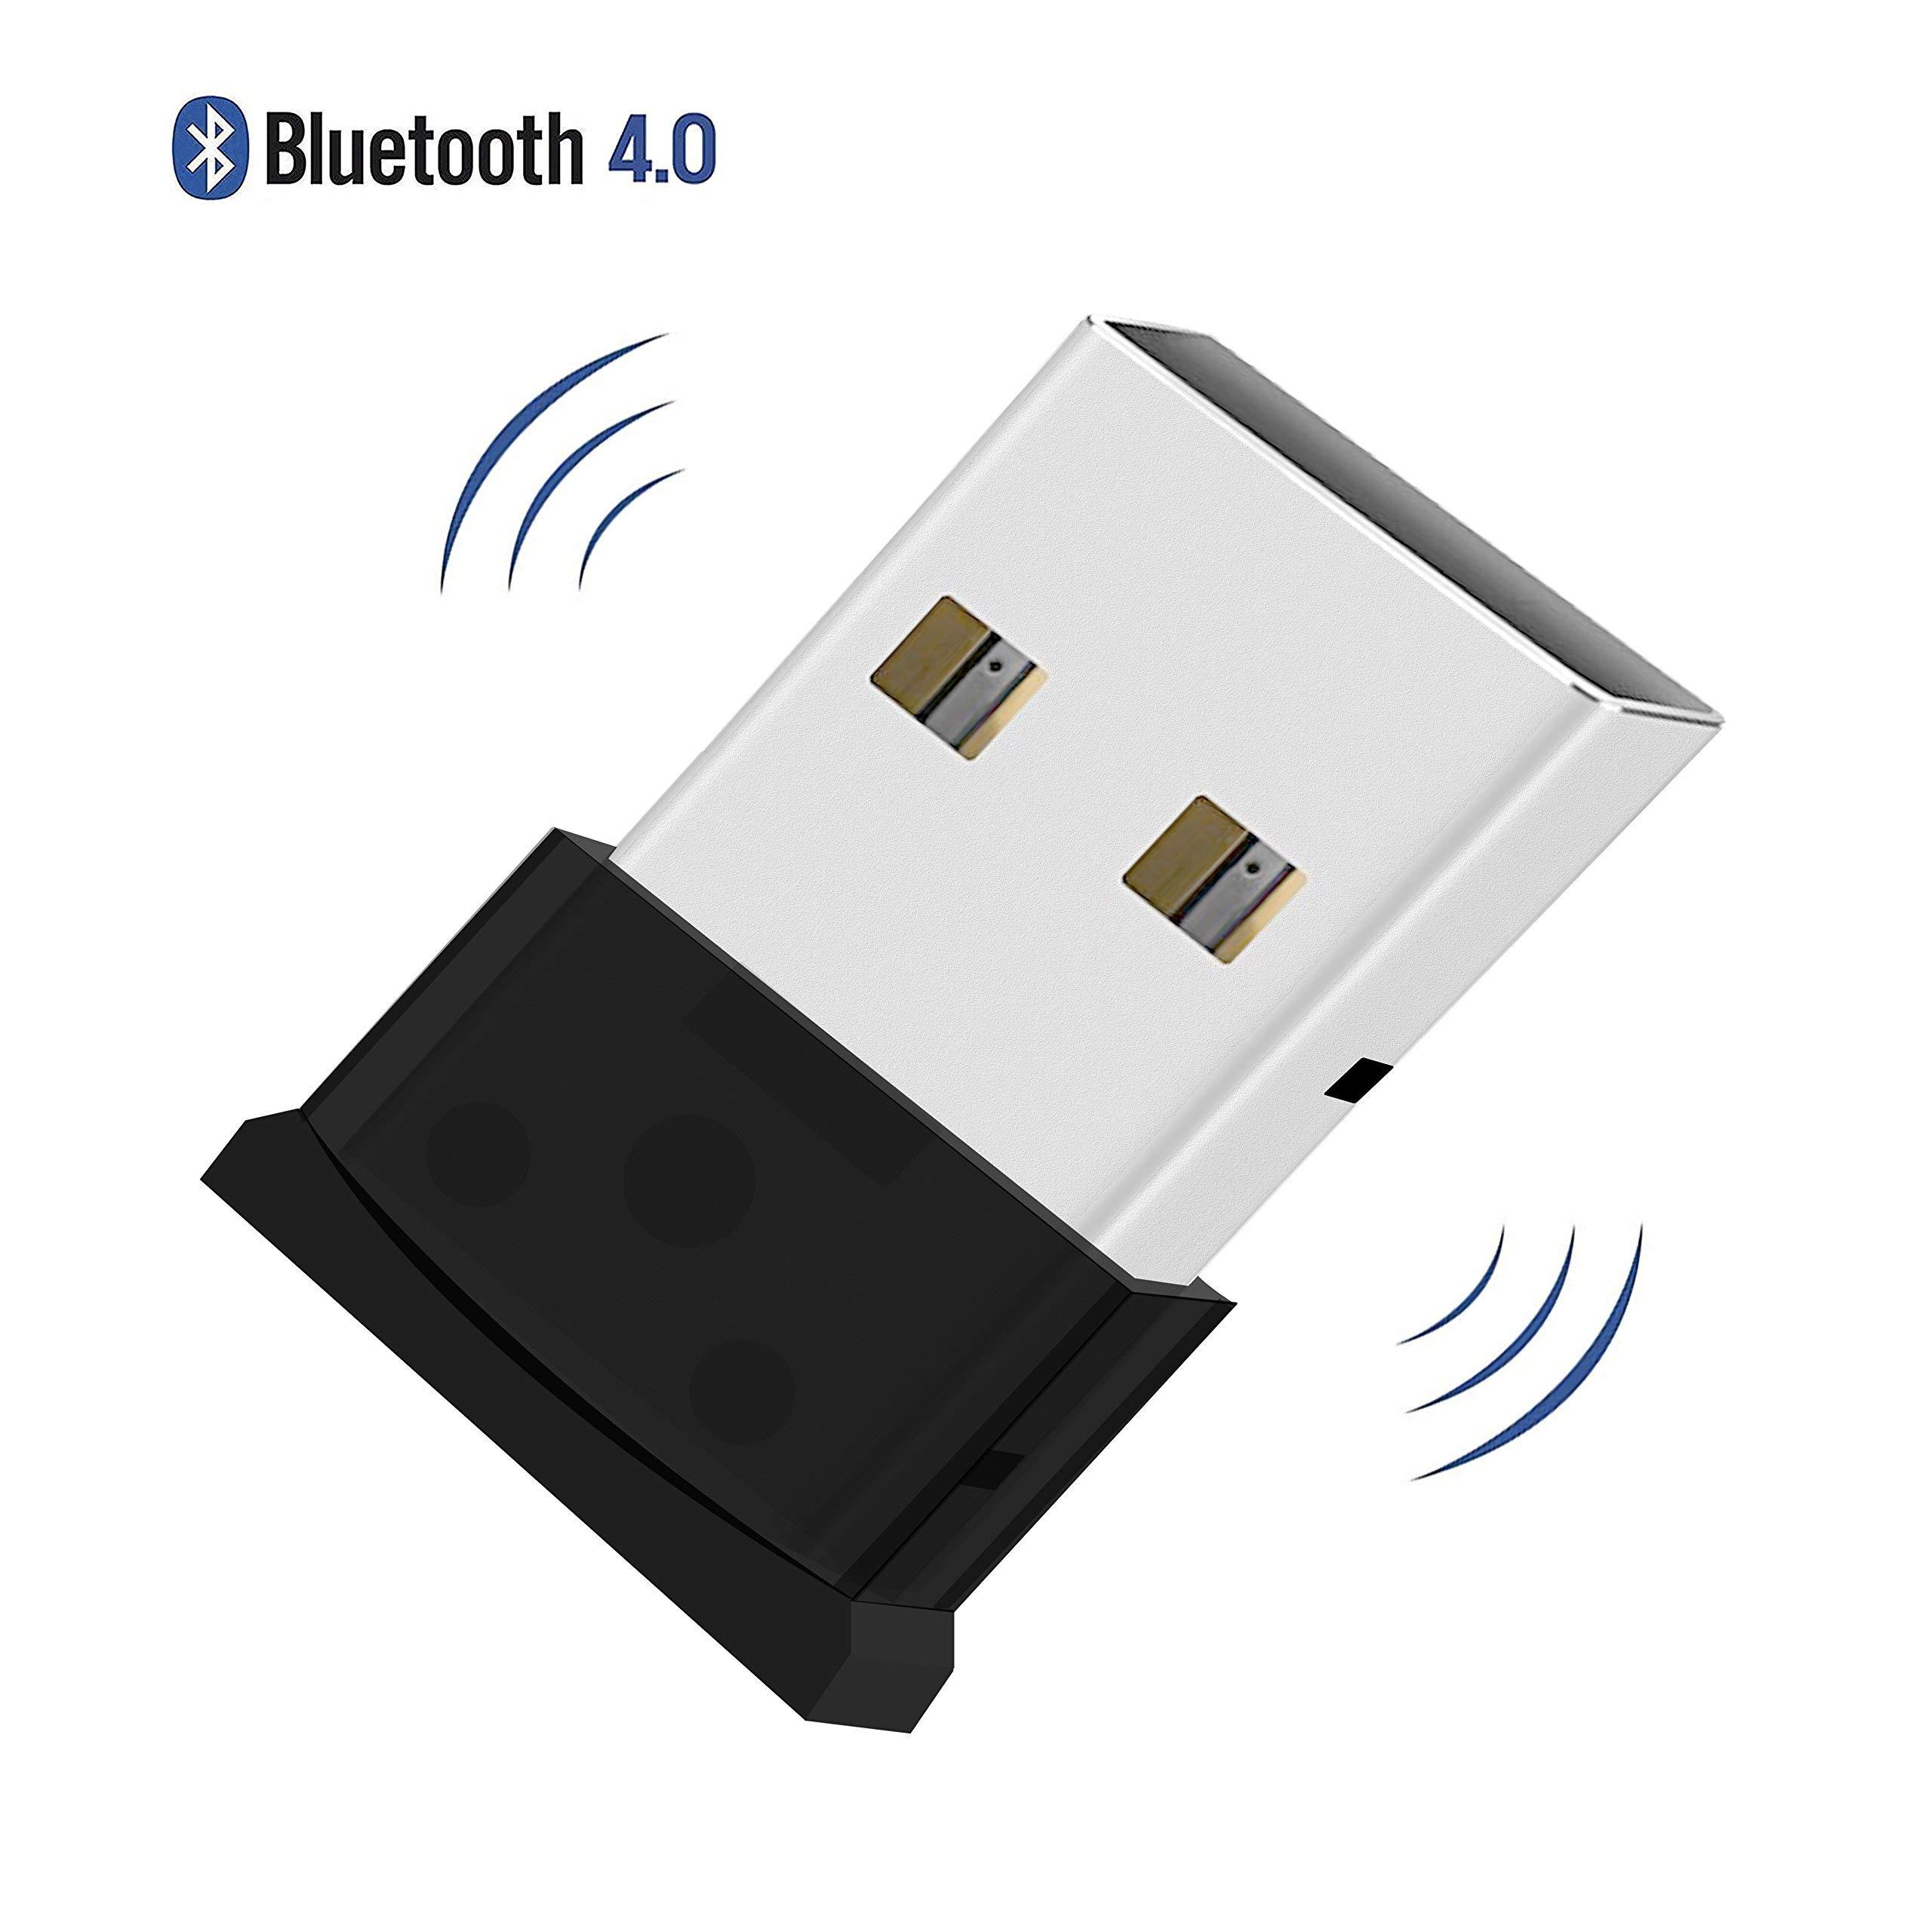 QueenDer Adattatore Bluetooth USB Nano Dongle Bluetooth 4.0 Wireless  08ca5c2fb9e8